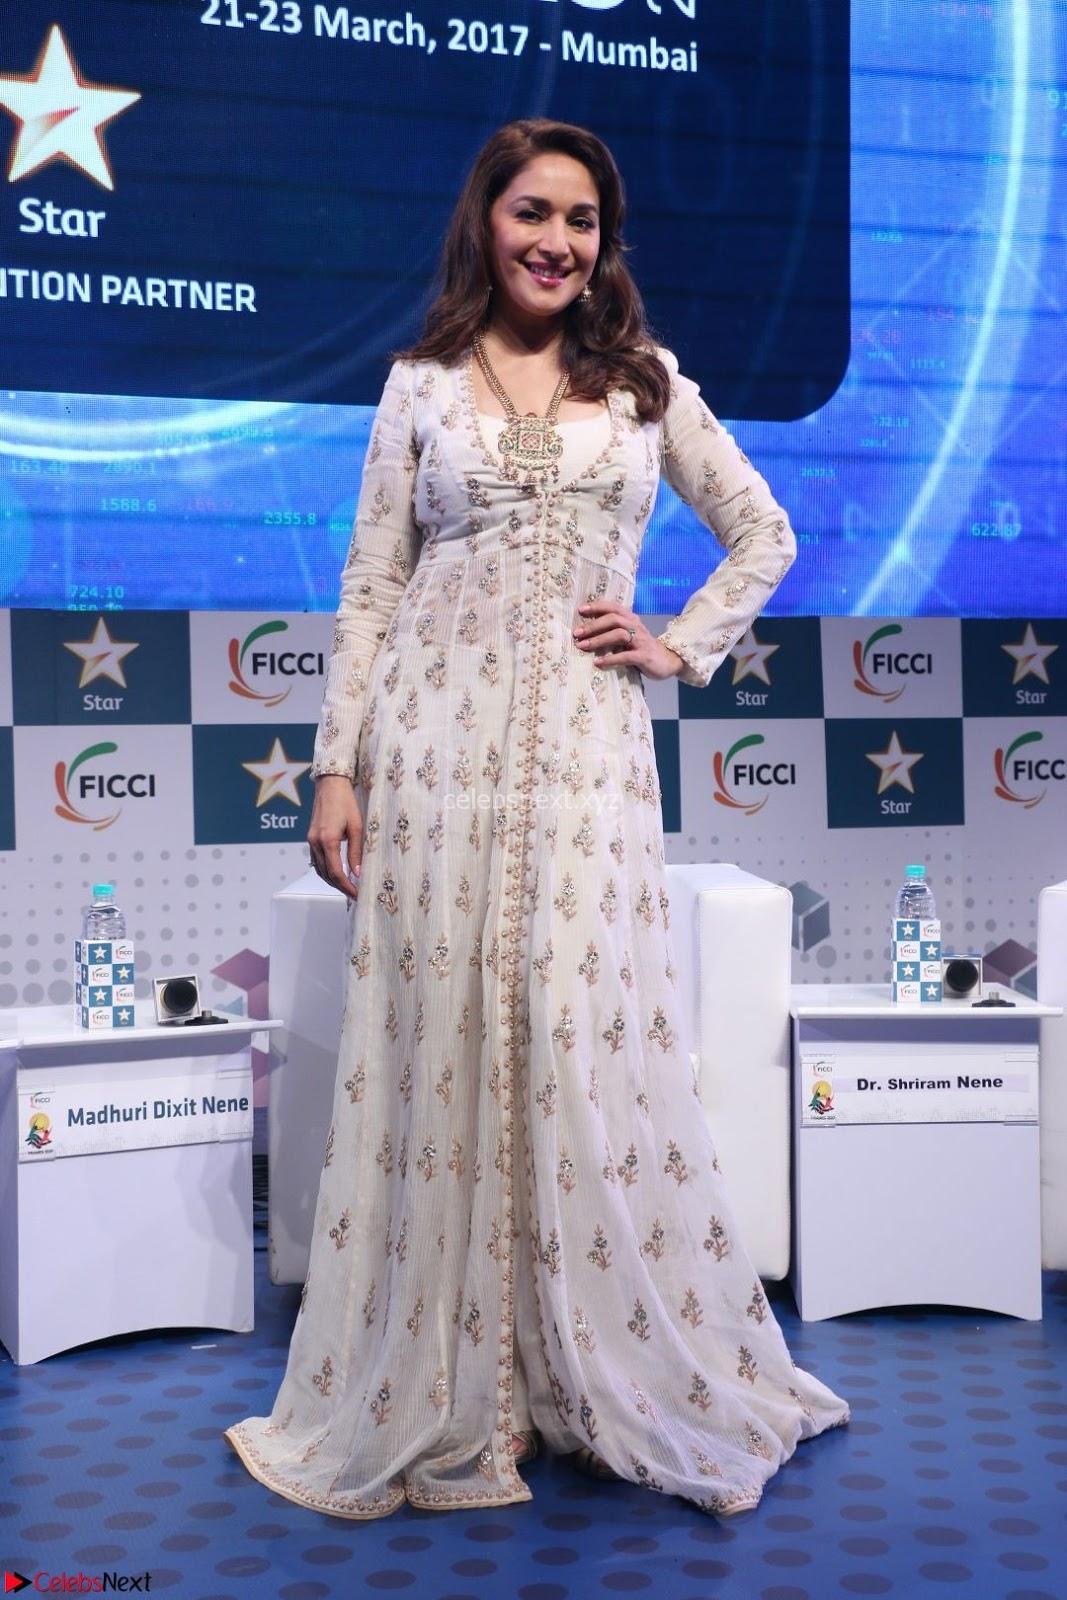 Madhuri Dixit Nene Looks Gorgeous with her husband Sriram Madhav Nene At FICCI FRAMES 2017 23rd March 2017